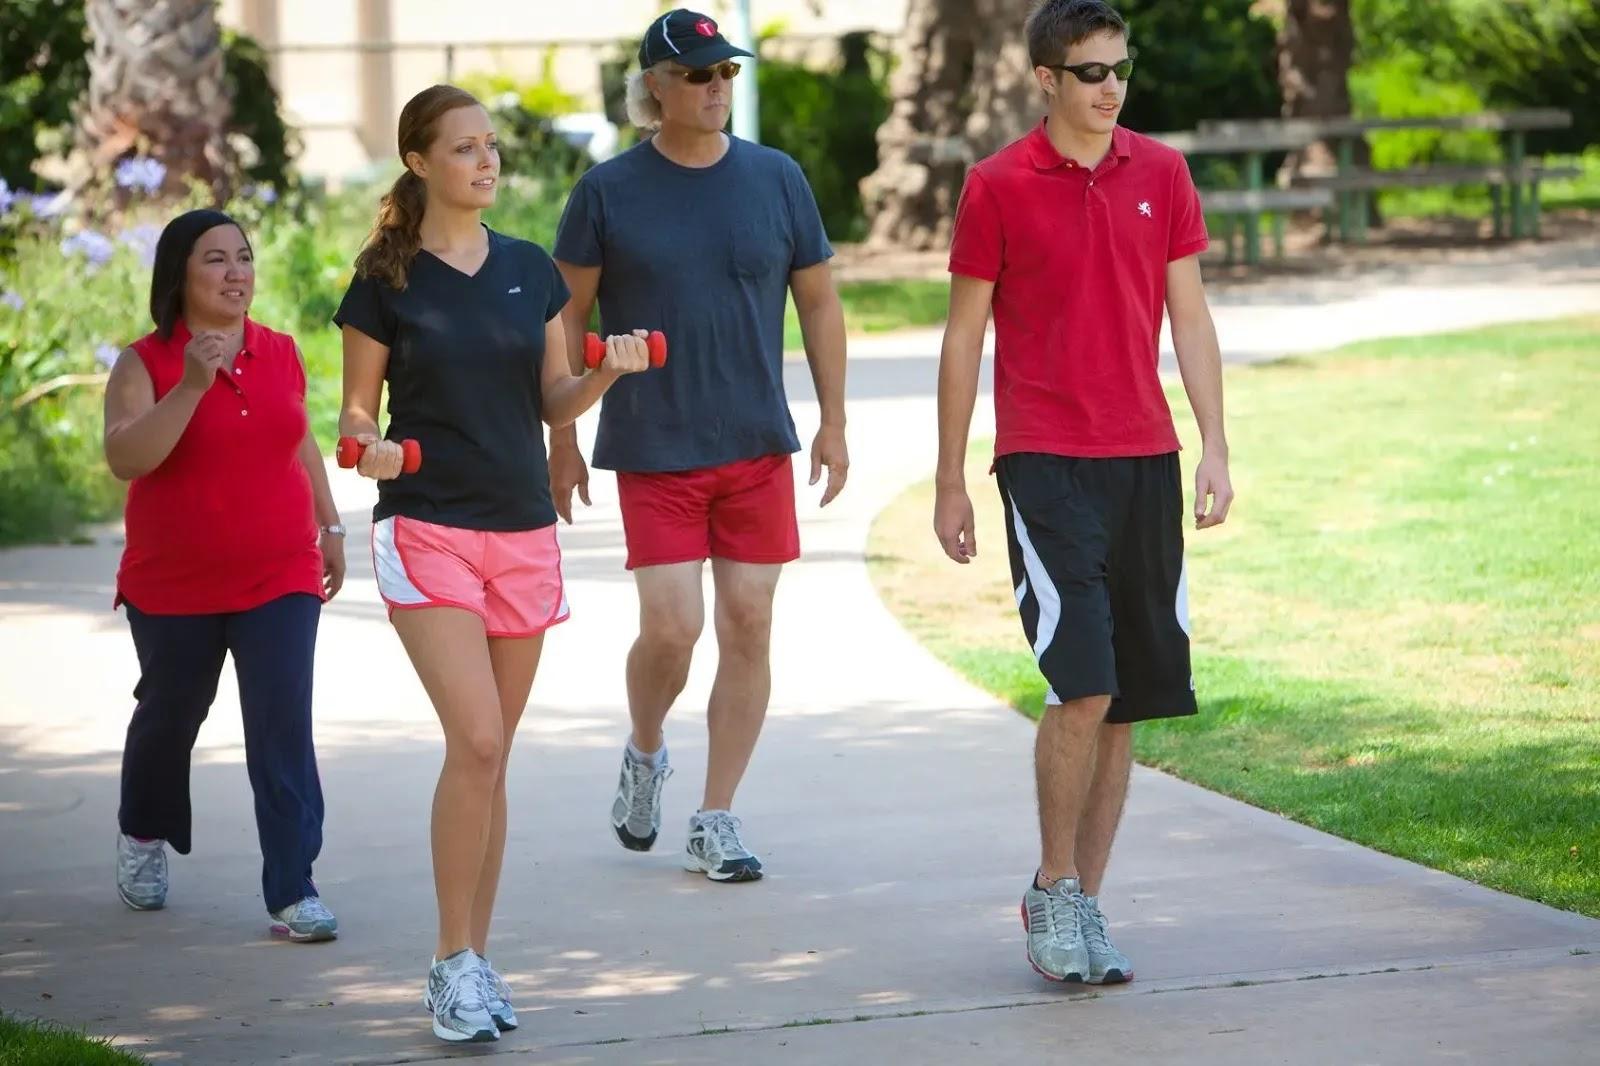 caminar-ayuda-a-perder-peso